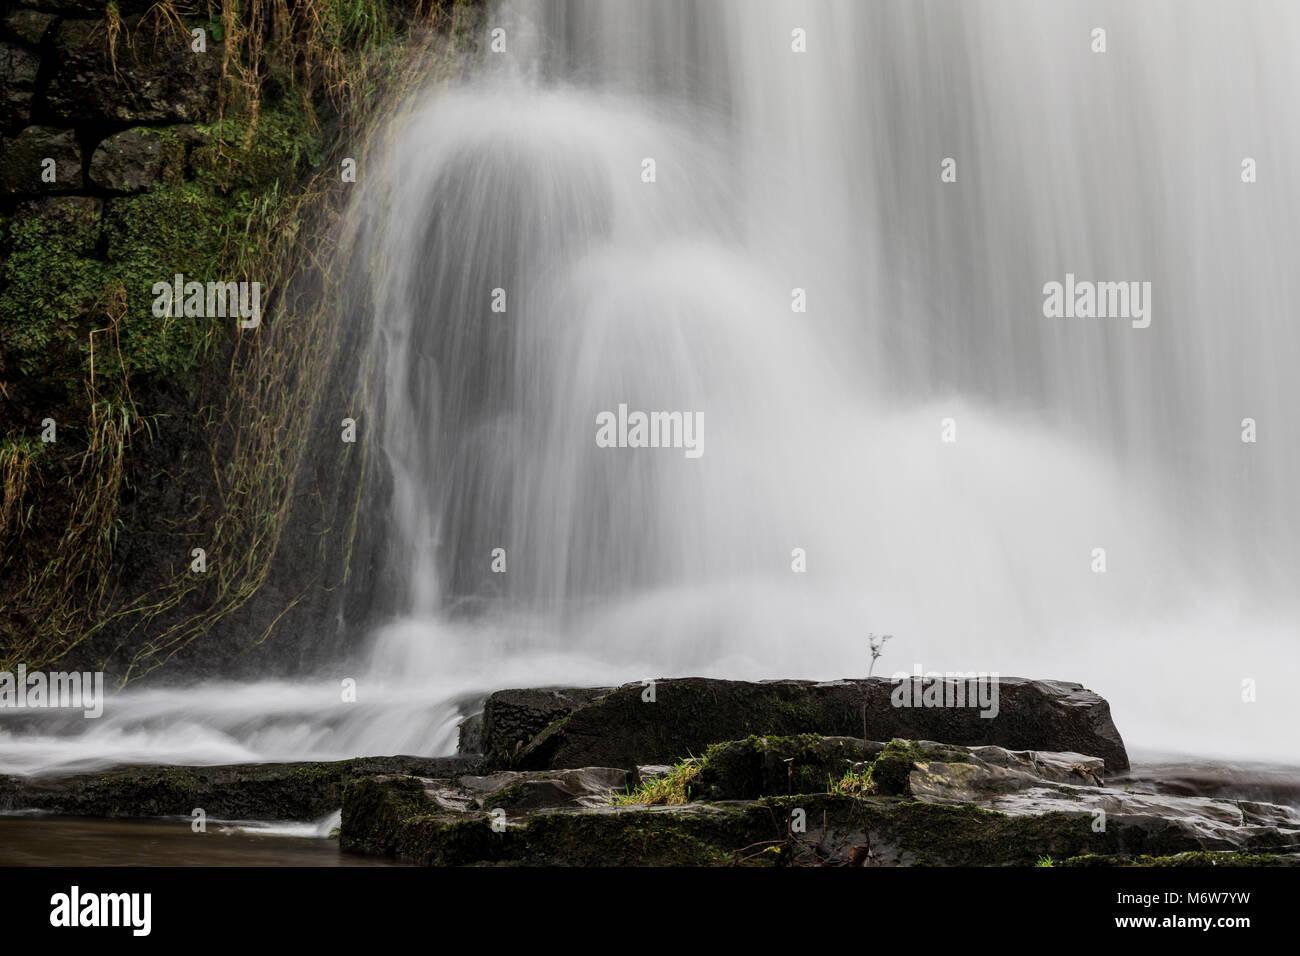 Bouncing Wasserfall Stockbild